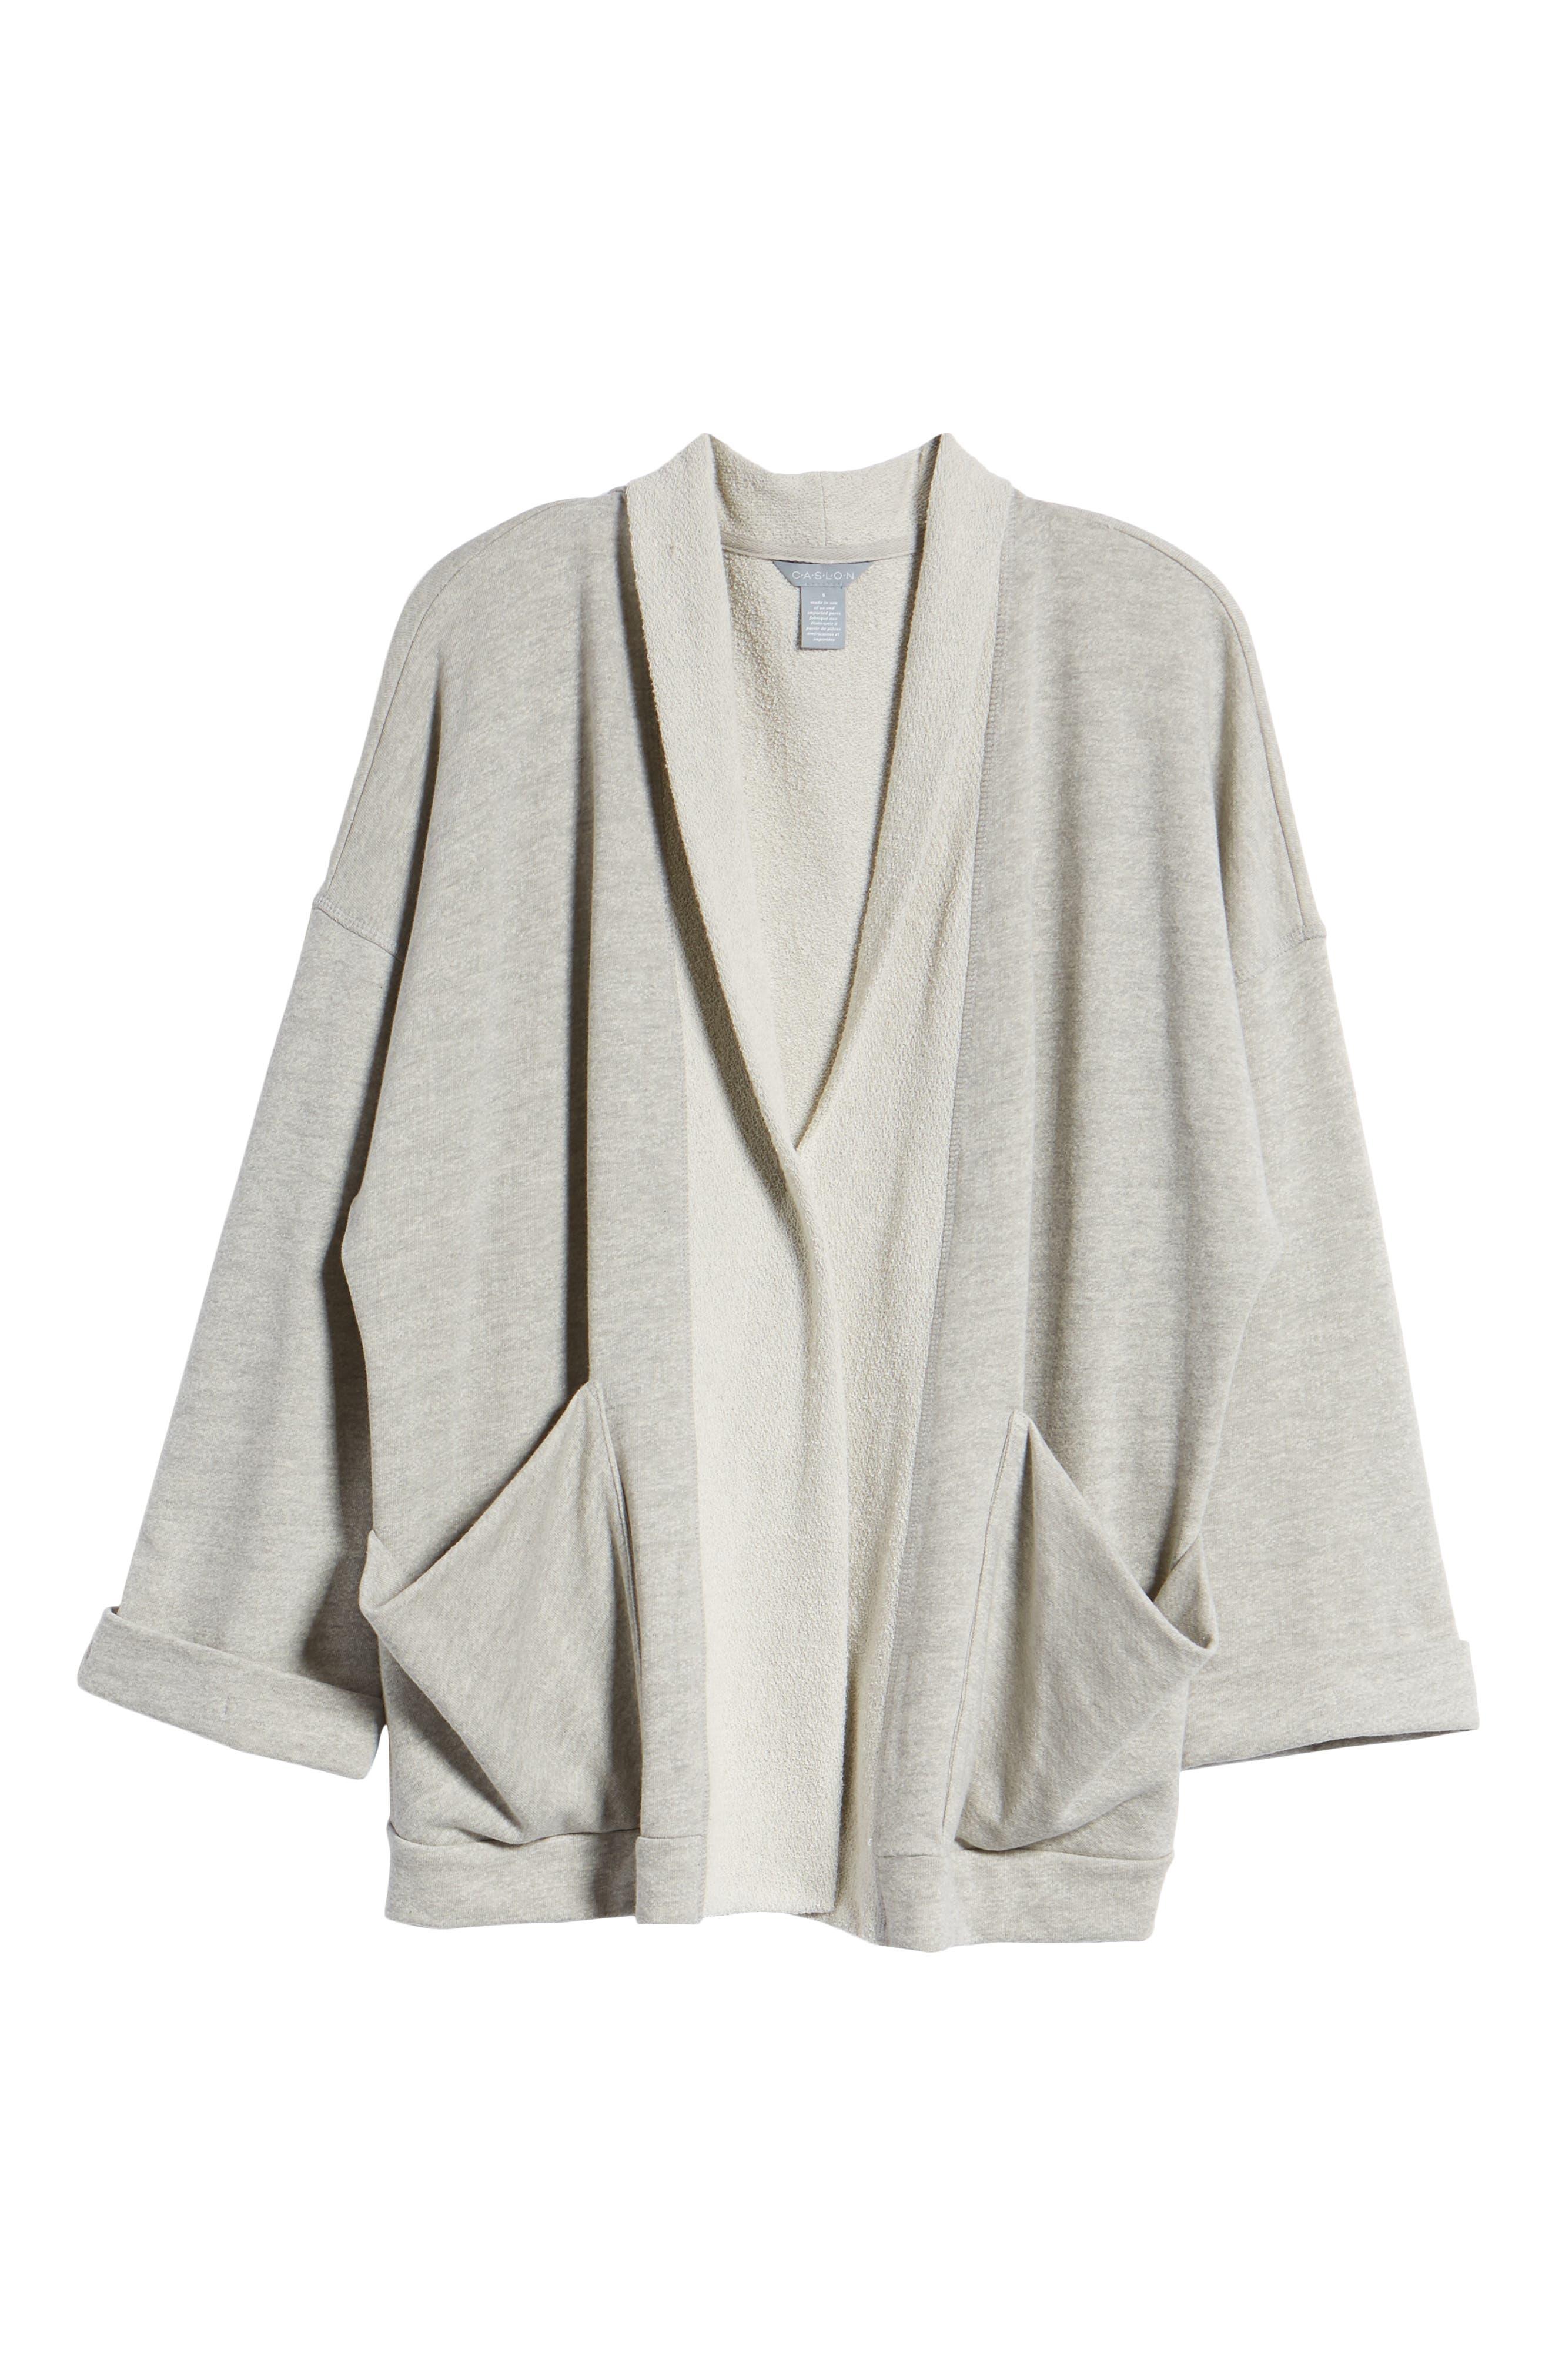 Off-Duty Roll Sleeve Cotton Blend Jacket,                             Alternate thumbnail 7, color,                             Grey Heather